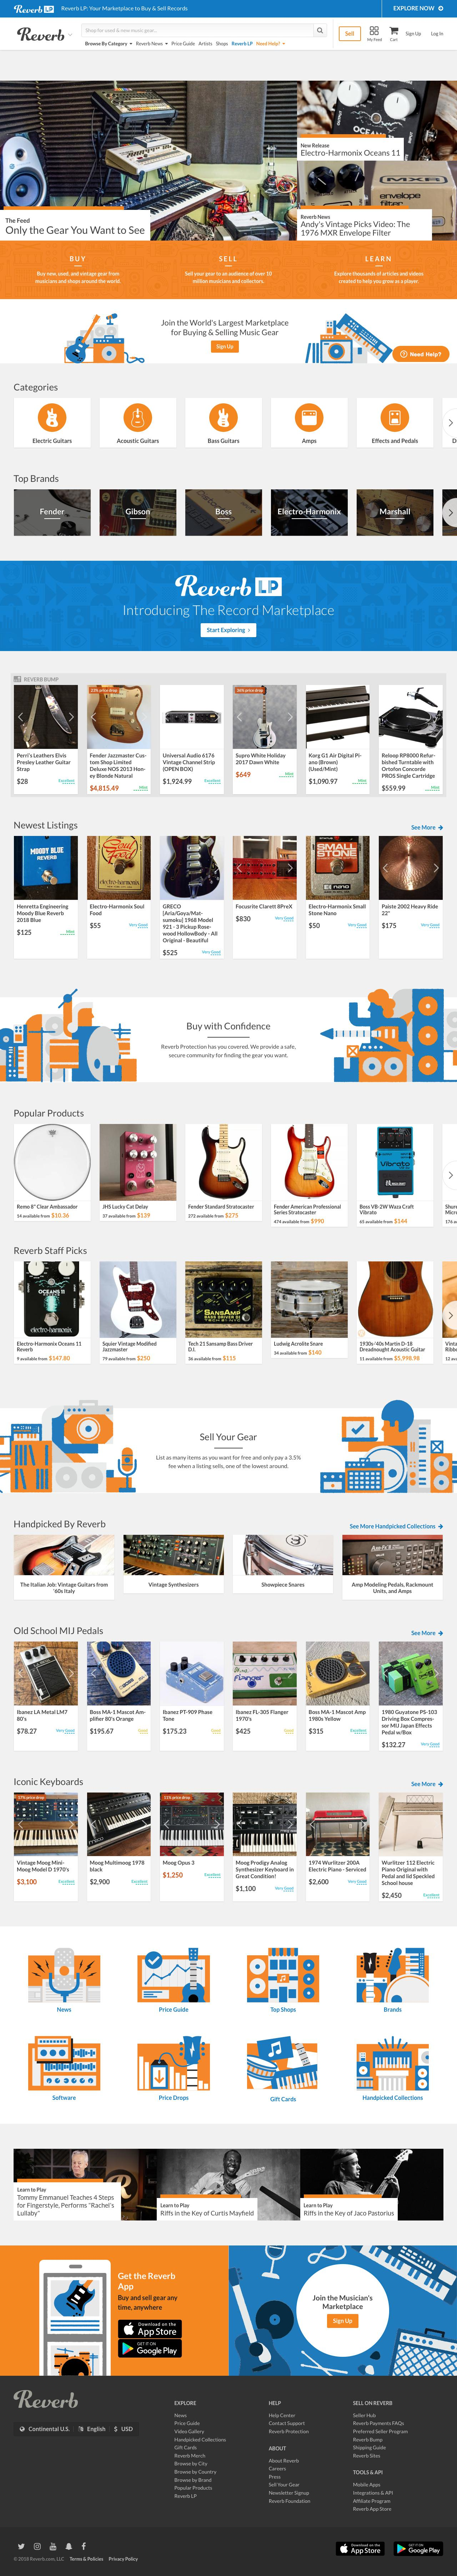 Screenshot of reverb.com - Buy & Sell Music Gear Online | Reverb - captured June 1, 2018